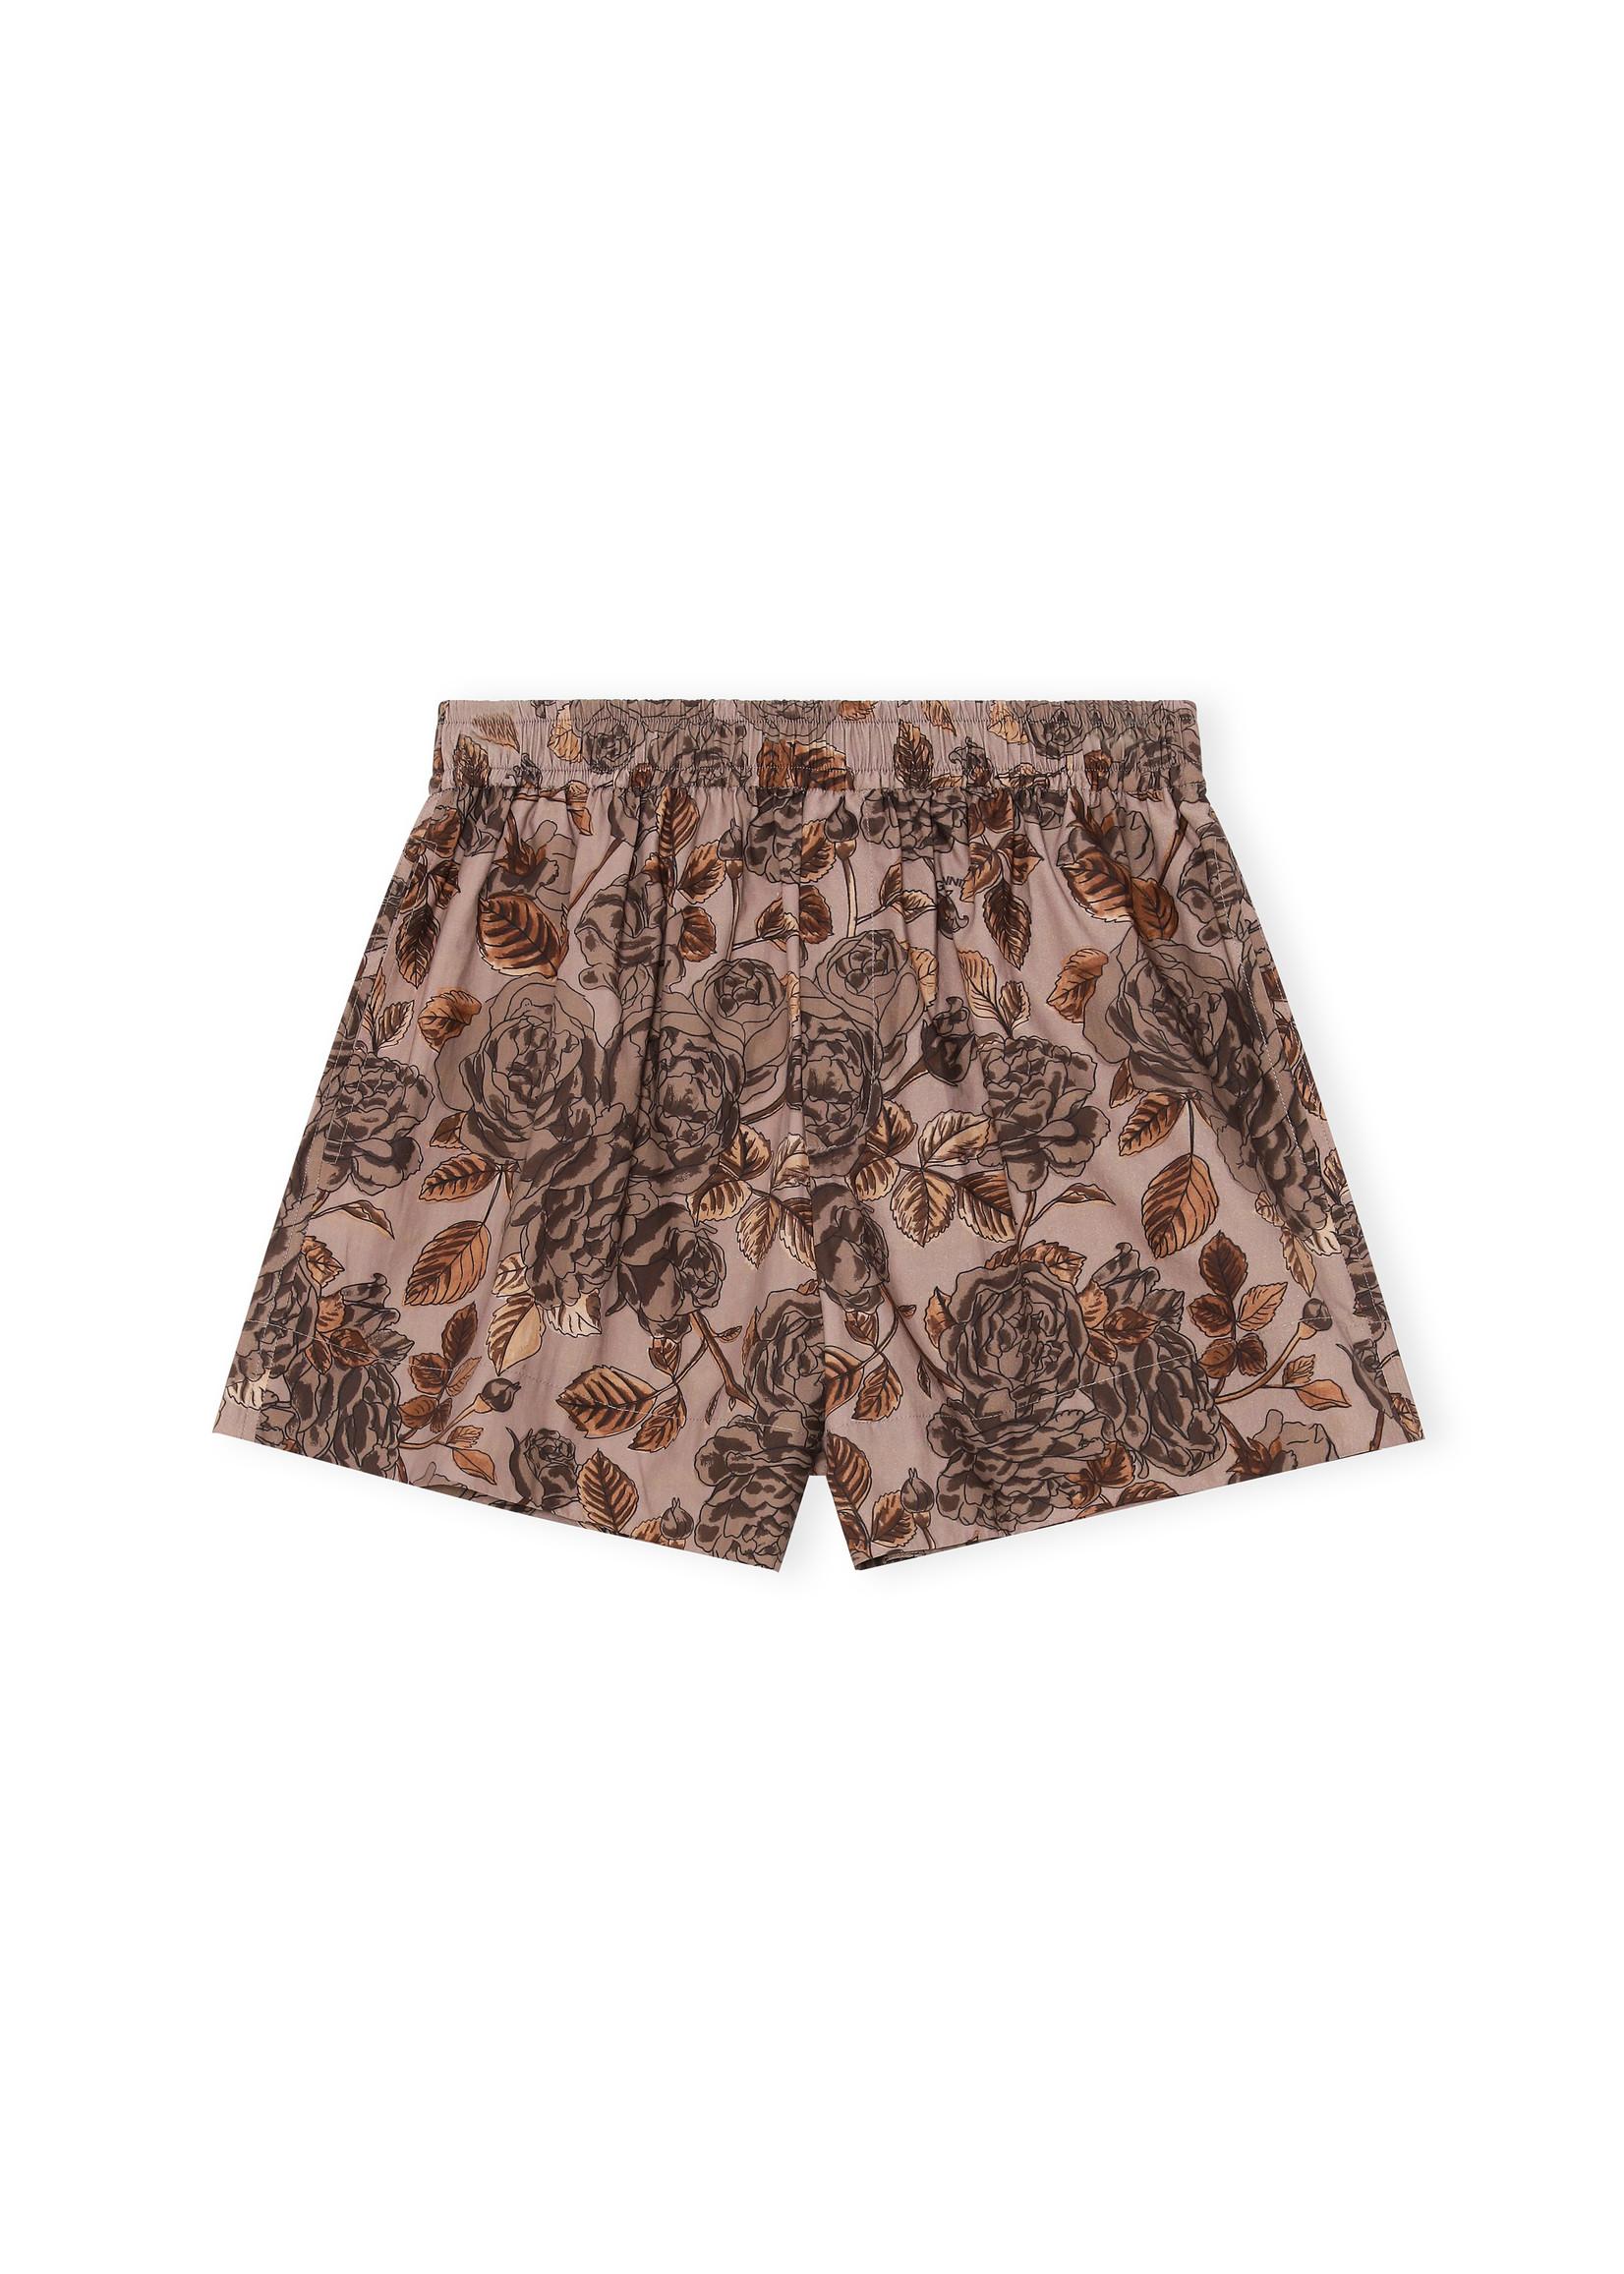 GANNI Elastic Waist Floral Shorts in Fossil